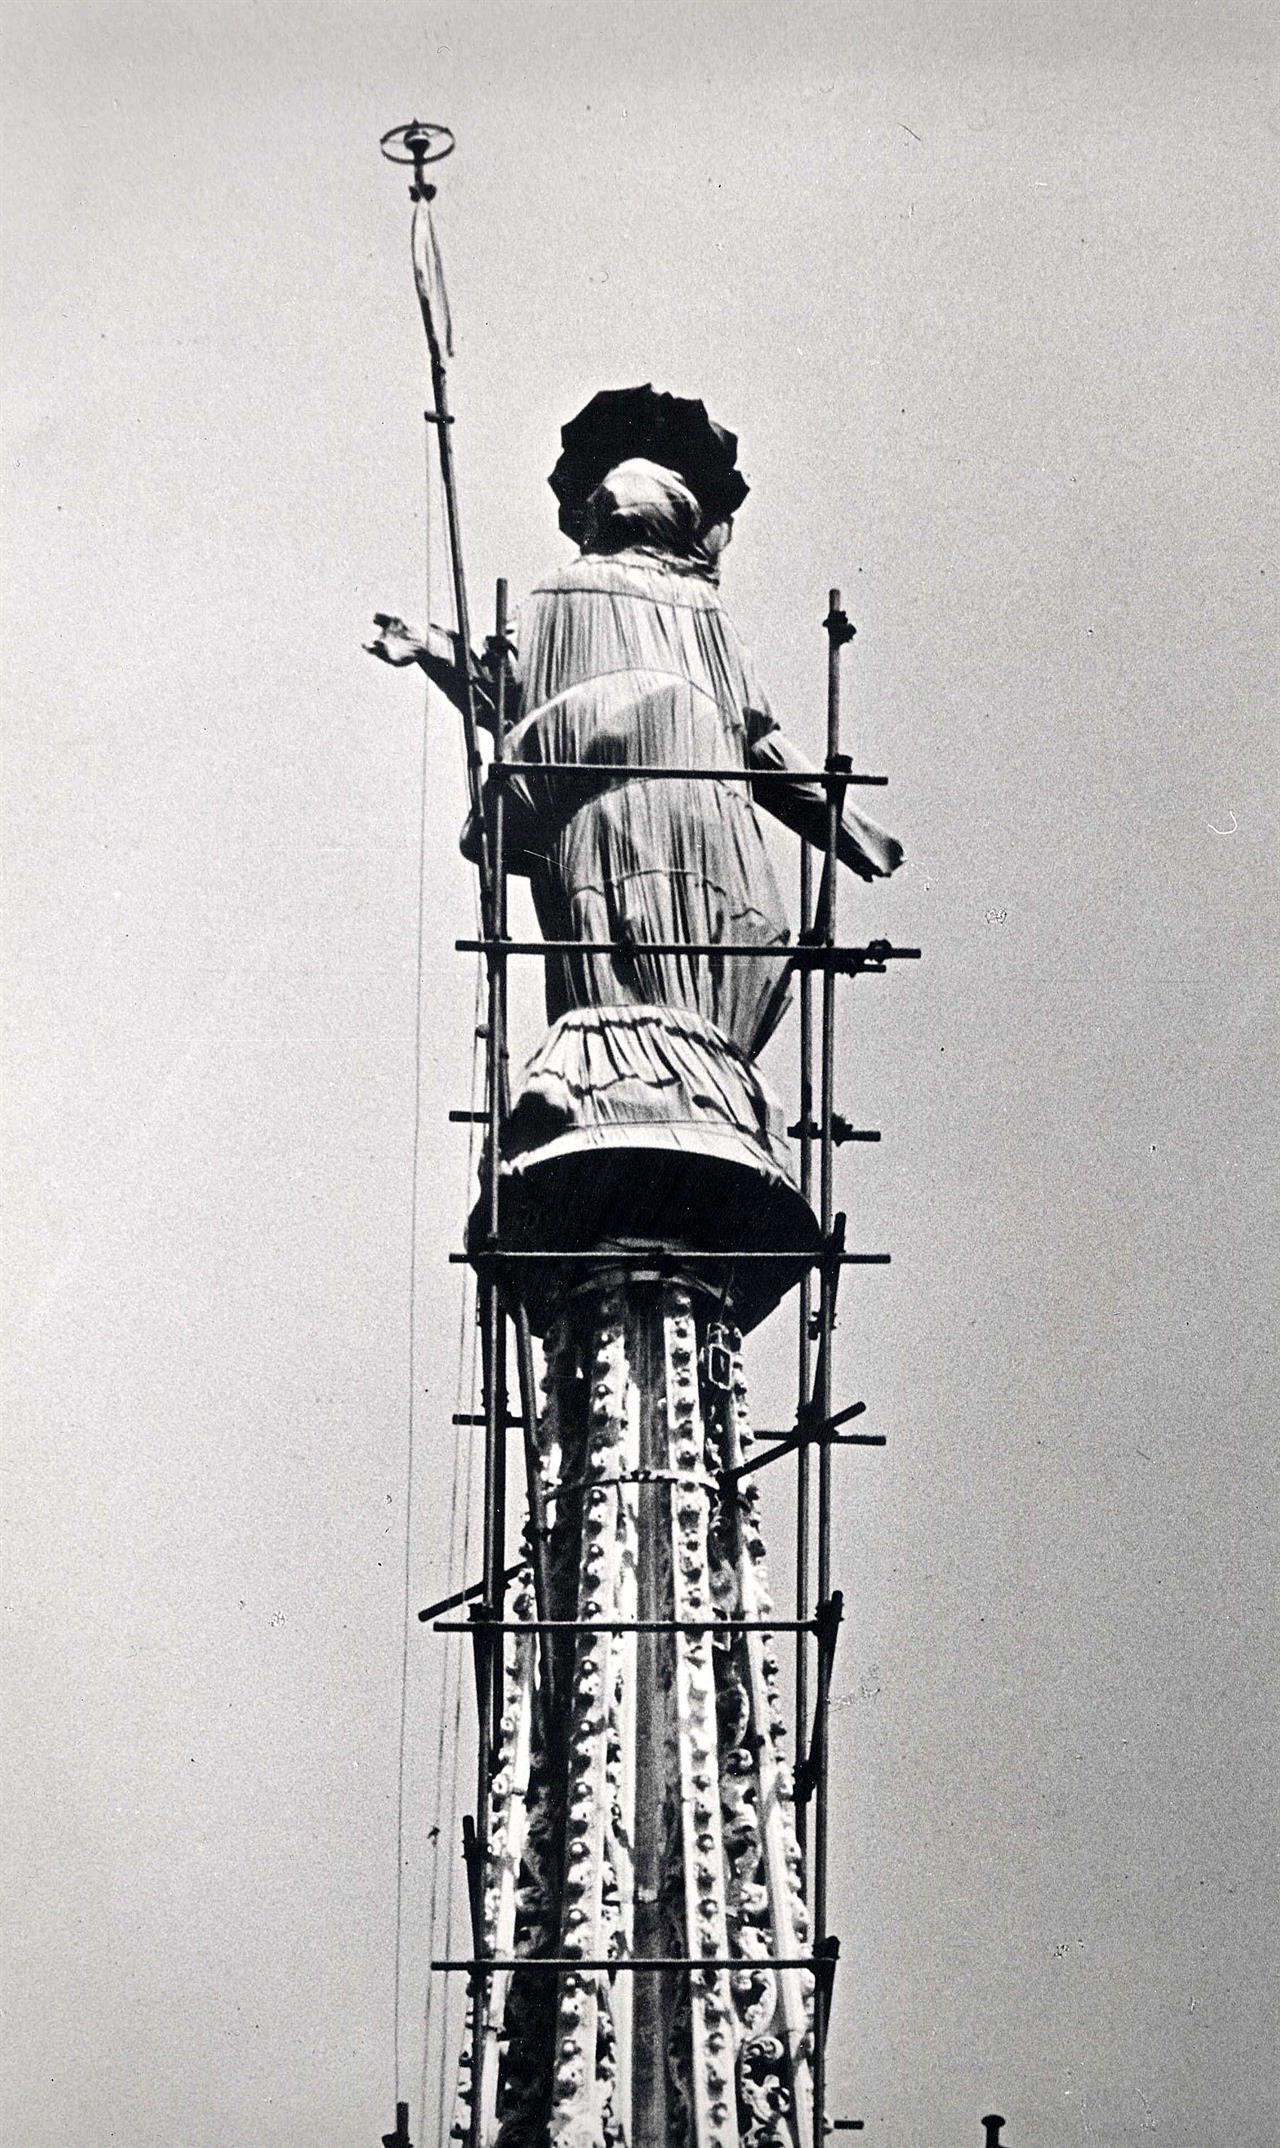 MADONNINA COPERTA PER INCURSIONI AEREE 21 6 1940 FV